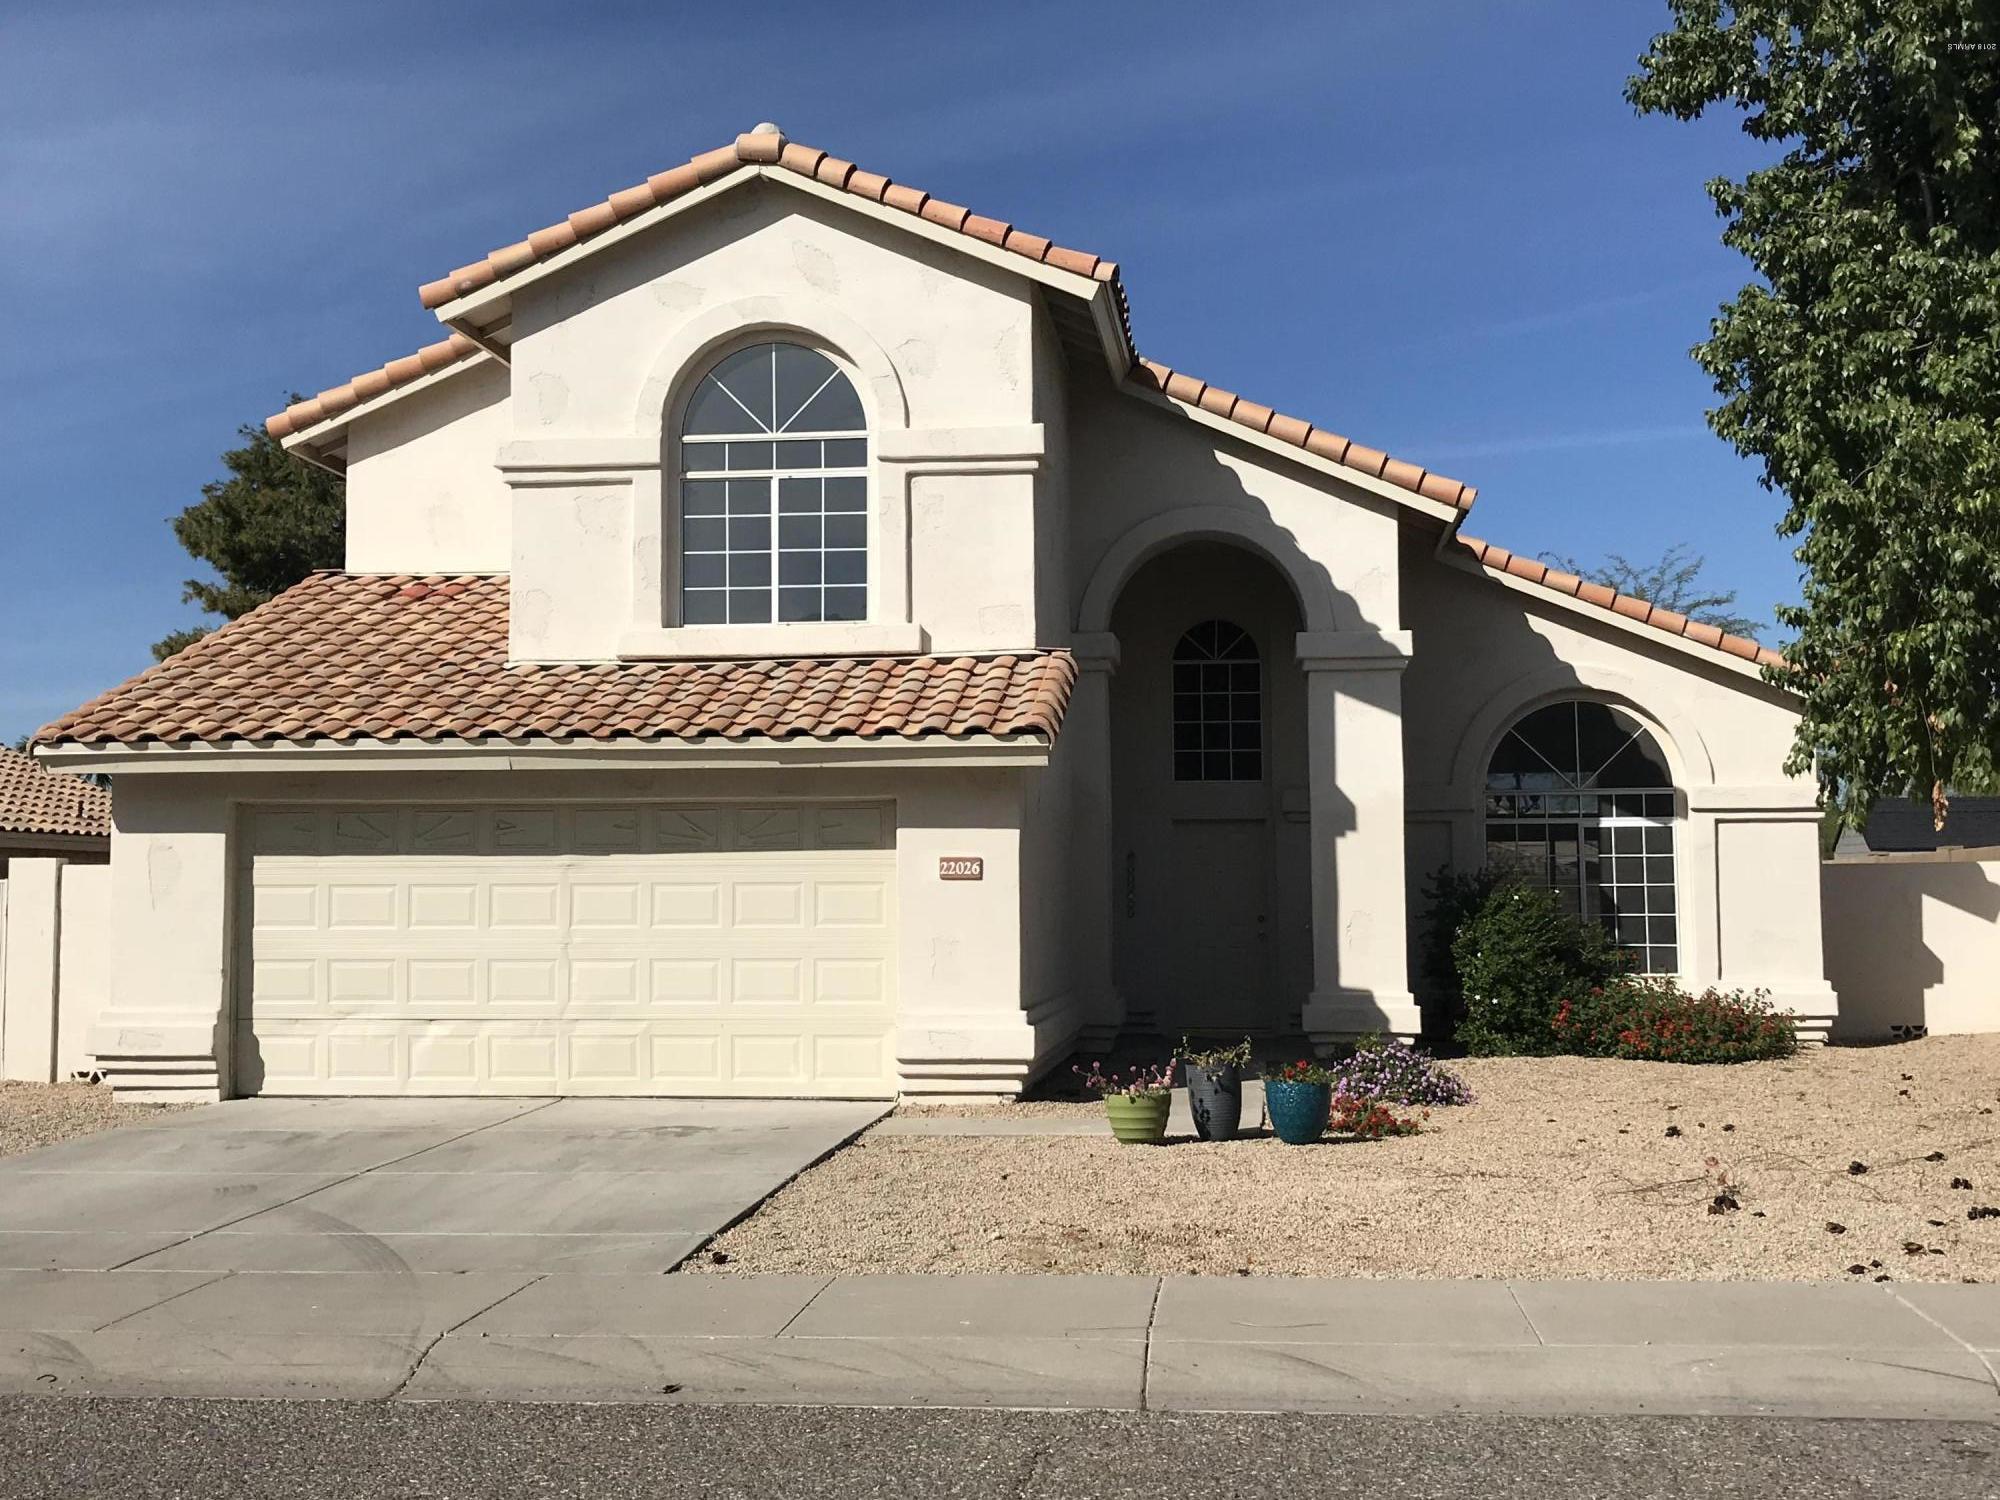 Photo of 22026 N 73RD Avenue, Glendale, AZ 85310